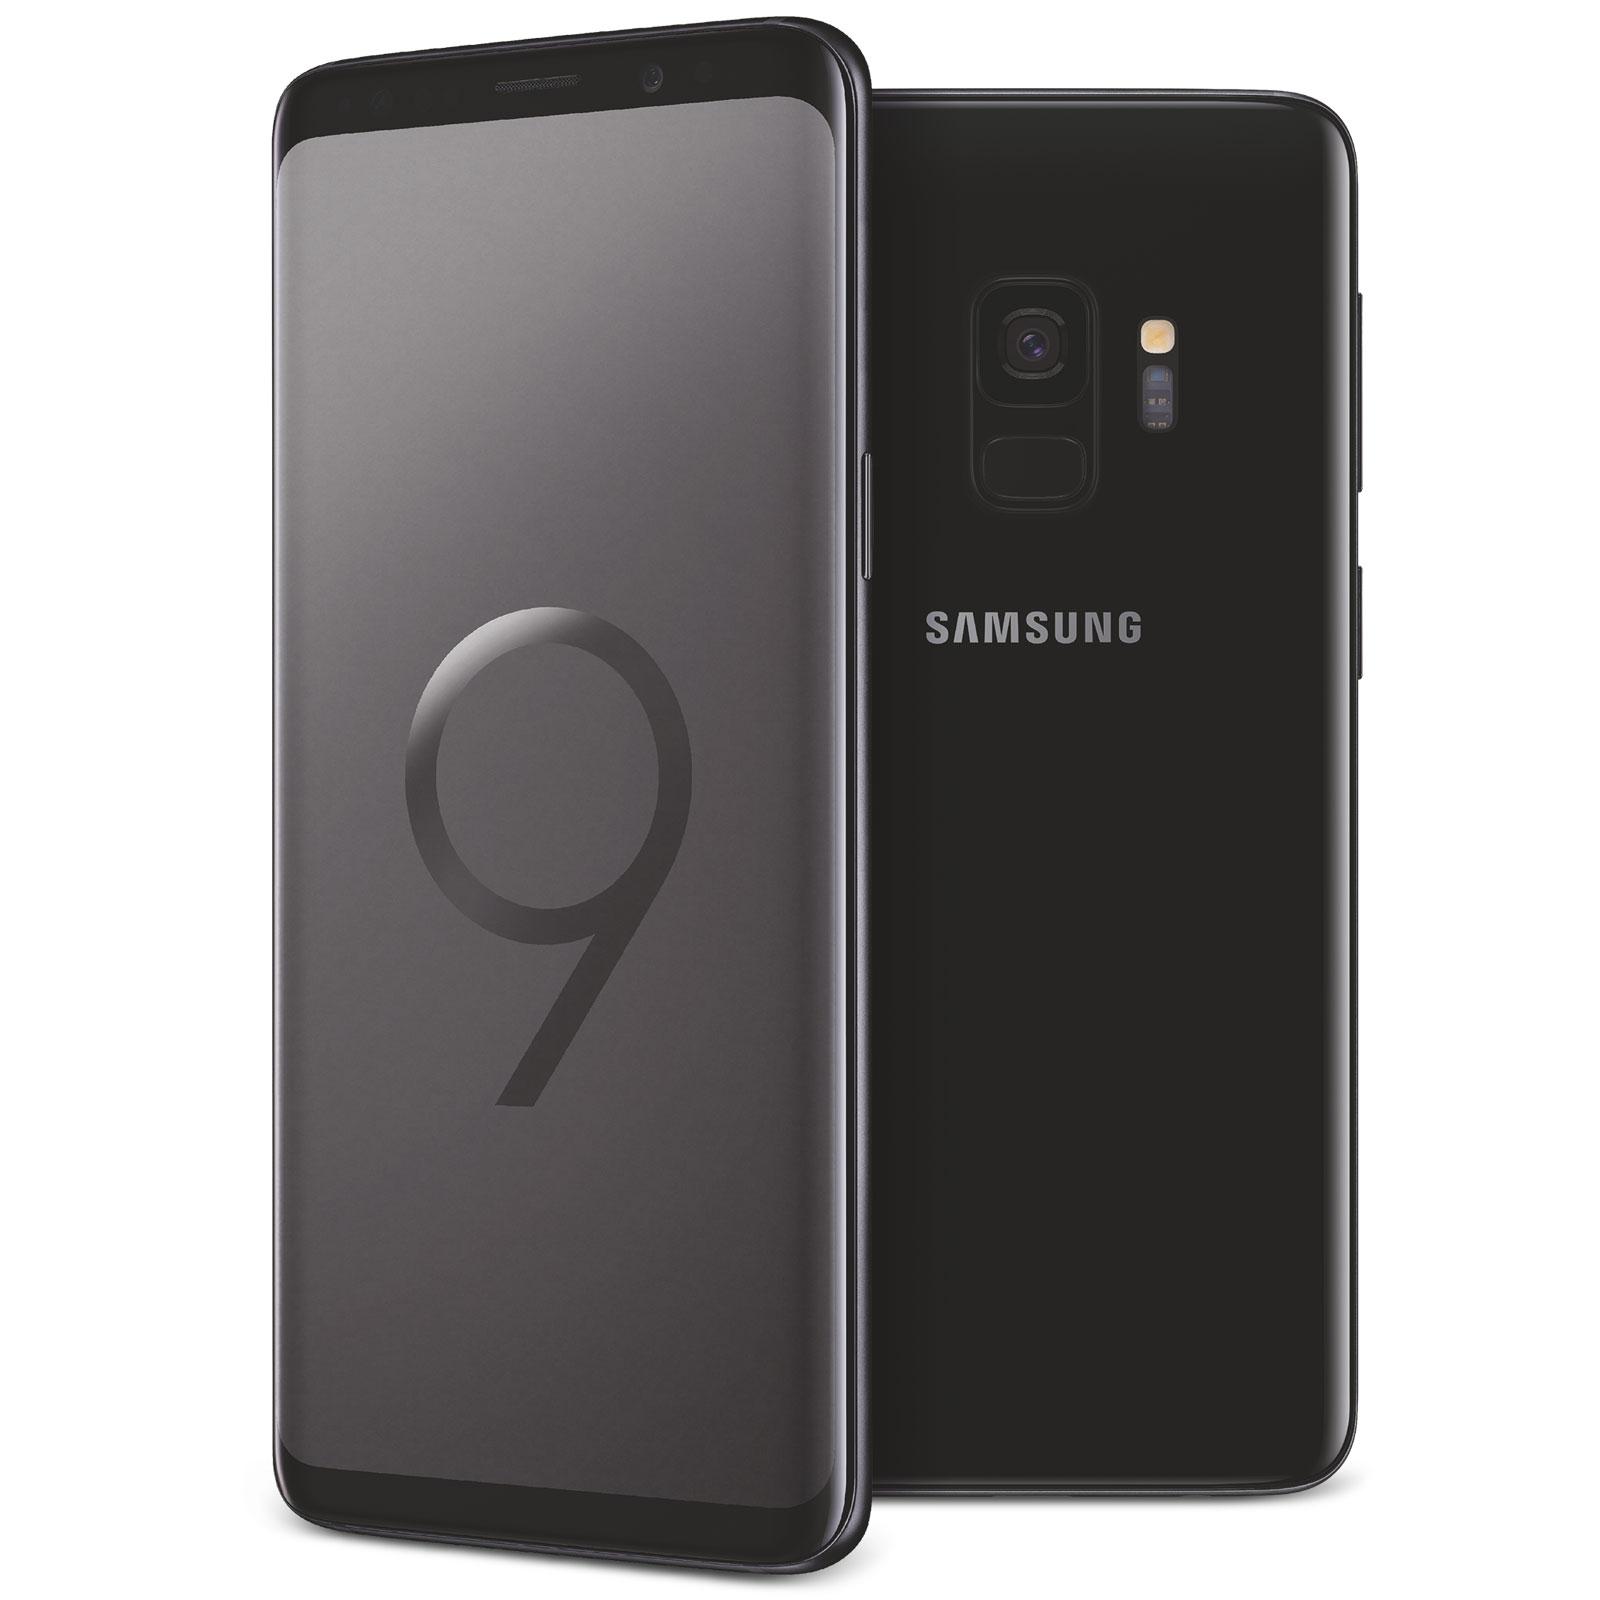 "Mobile & smartphone Samsung Galaxy S9 SM-G960F Noir Carbone 64 Go Smartphone 4G-LTE Advanced IP68 - Exynos 9810 8-Core 2.7 GHz - RAM 4 Go - Ecran tactile 5.8"" 1440 x 2960 - 64 Go - NFC/Bluetooth 5.0 - 3000 mAh - Android 8.0"